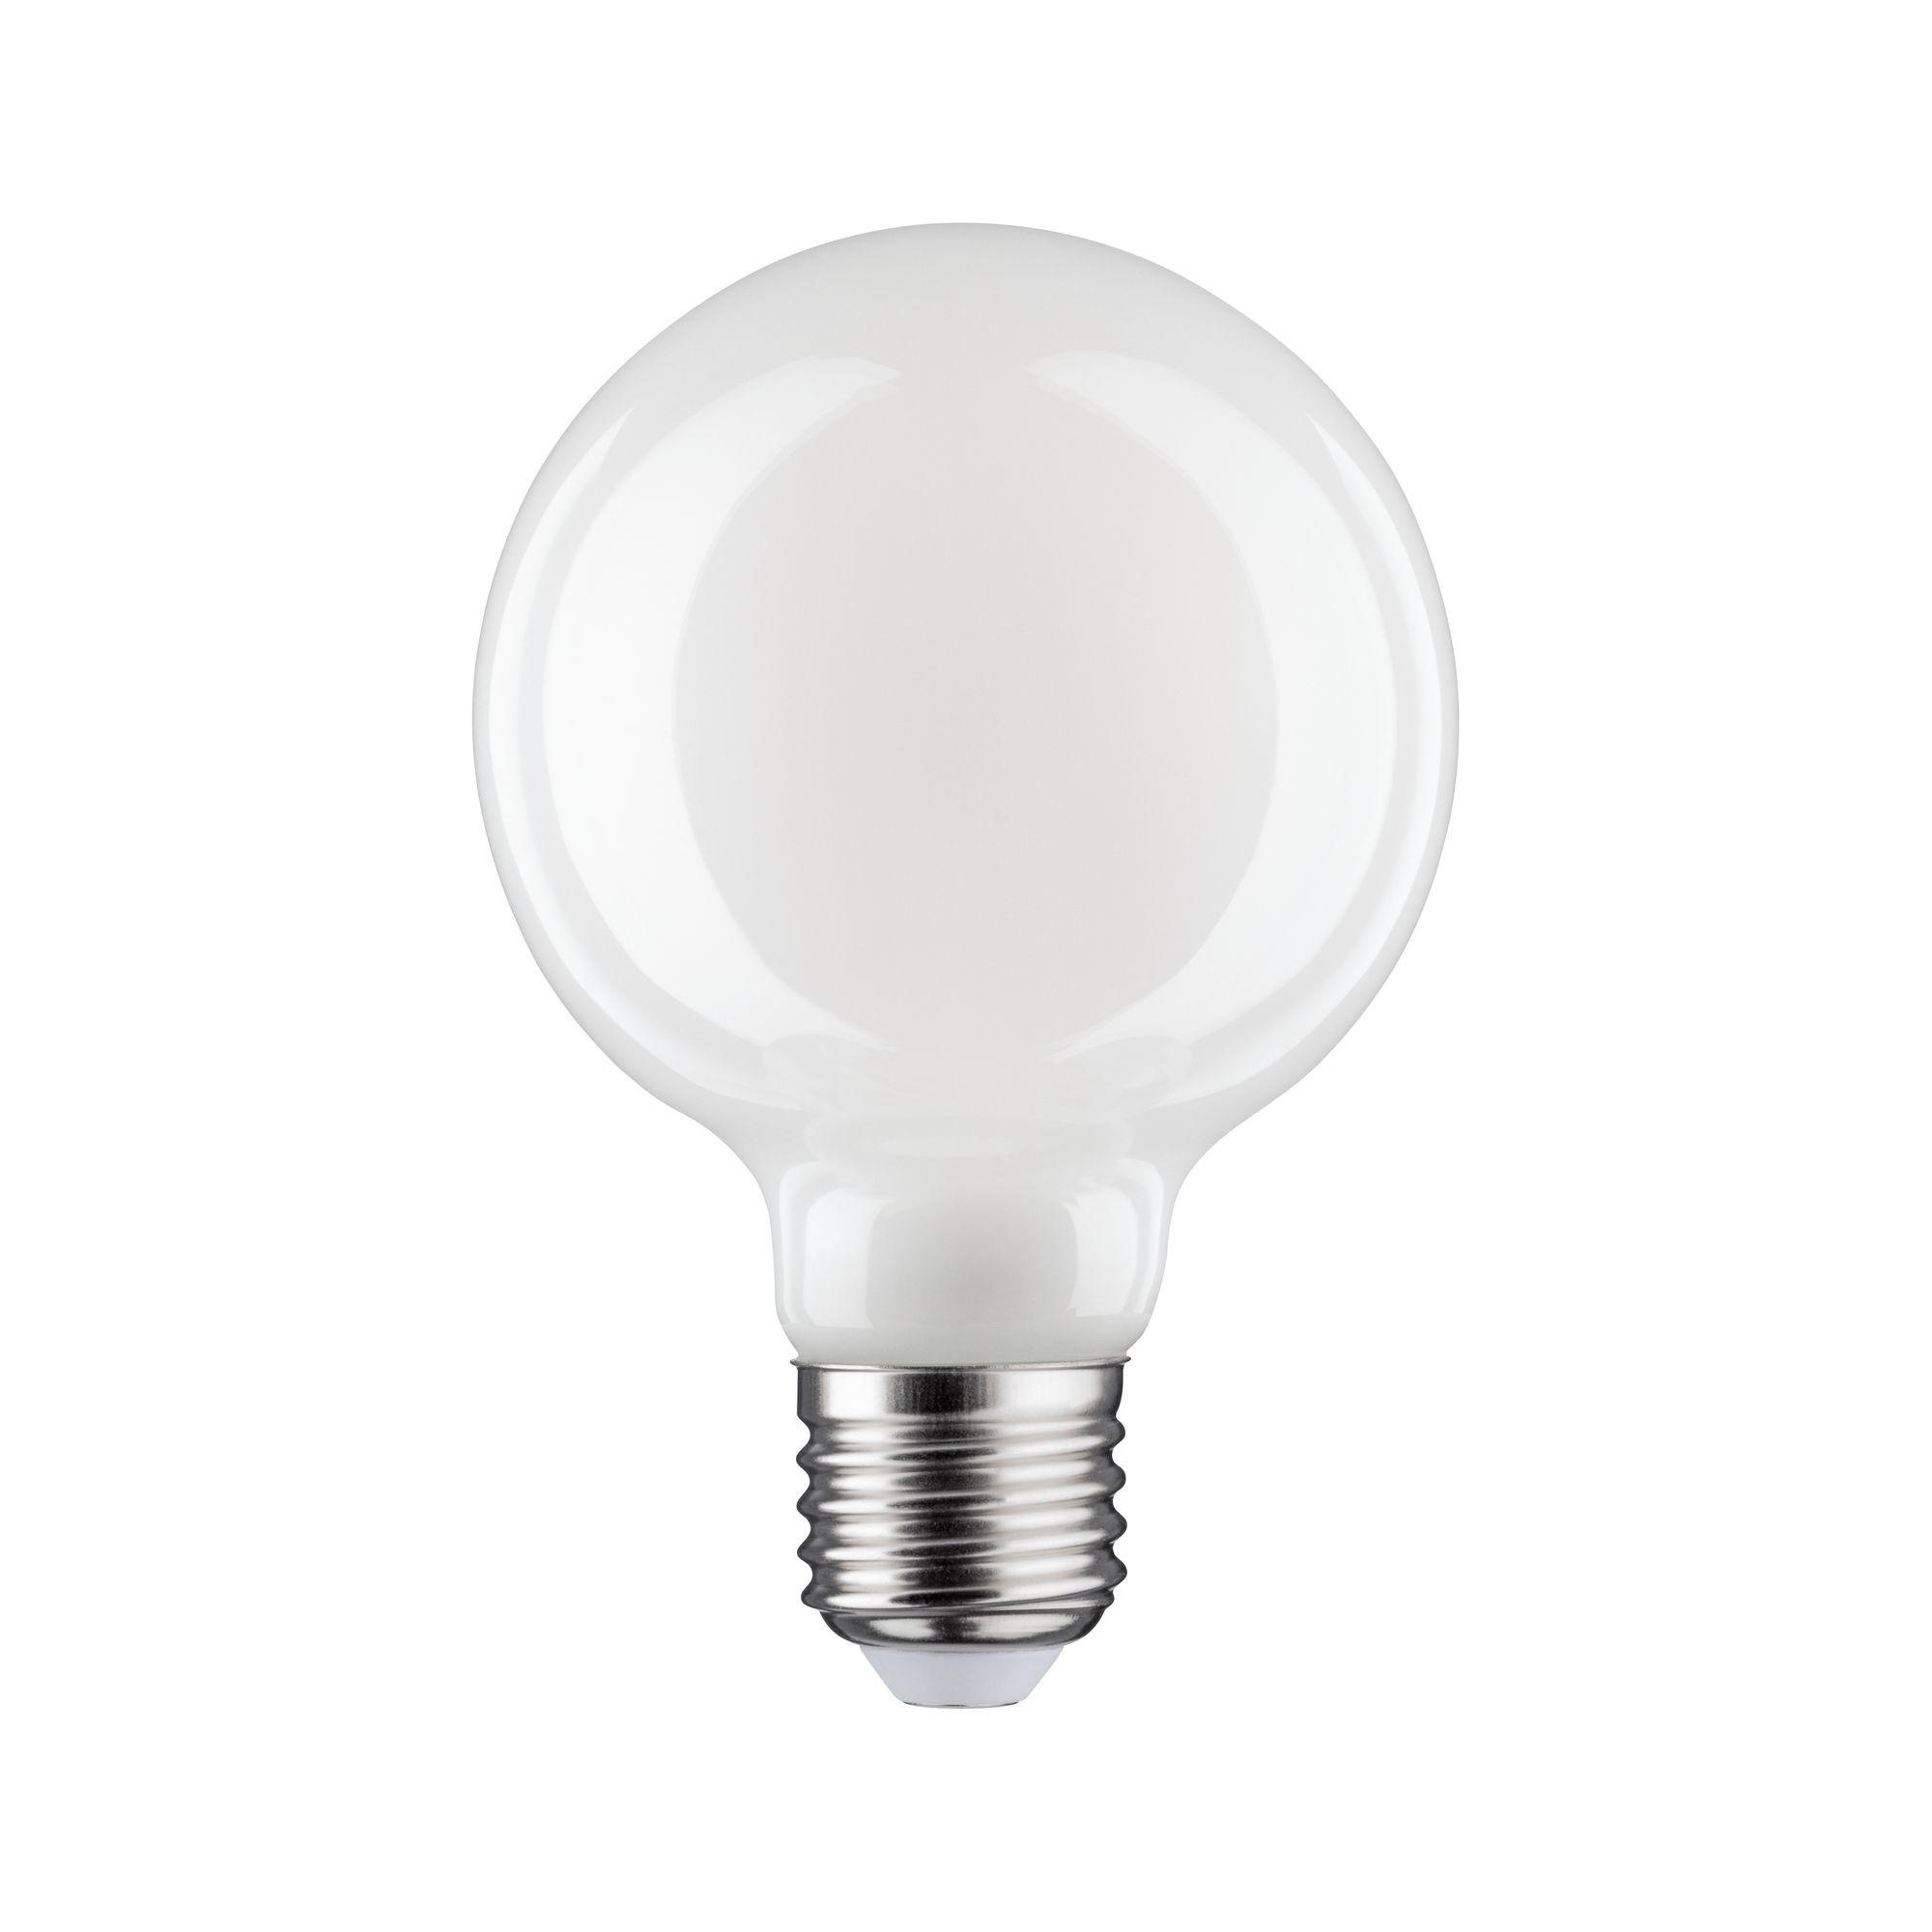 Paulmann LED Fil G80 470lm E27 2700K opal dim 6W 230V (28623)